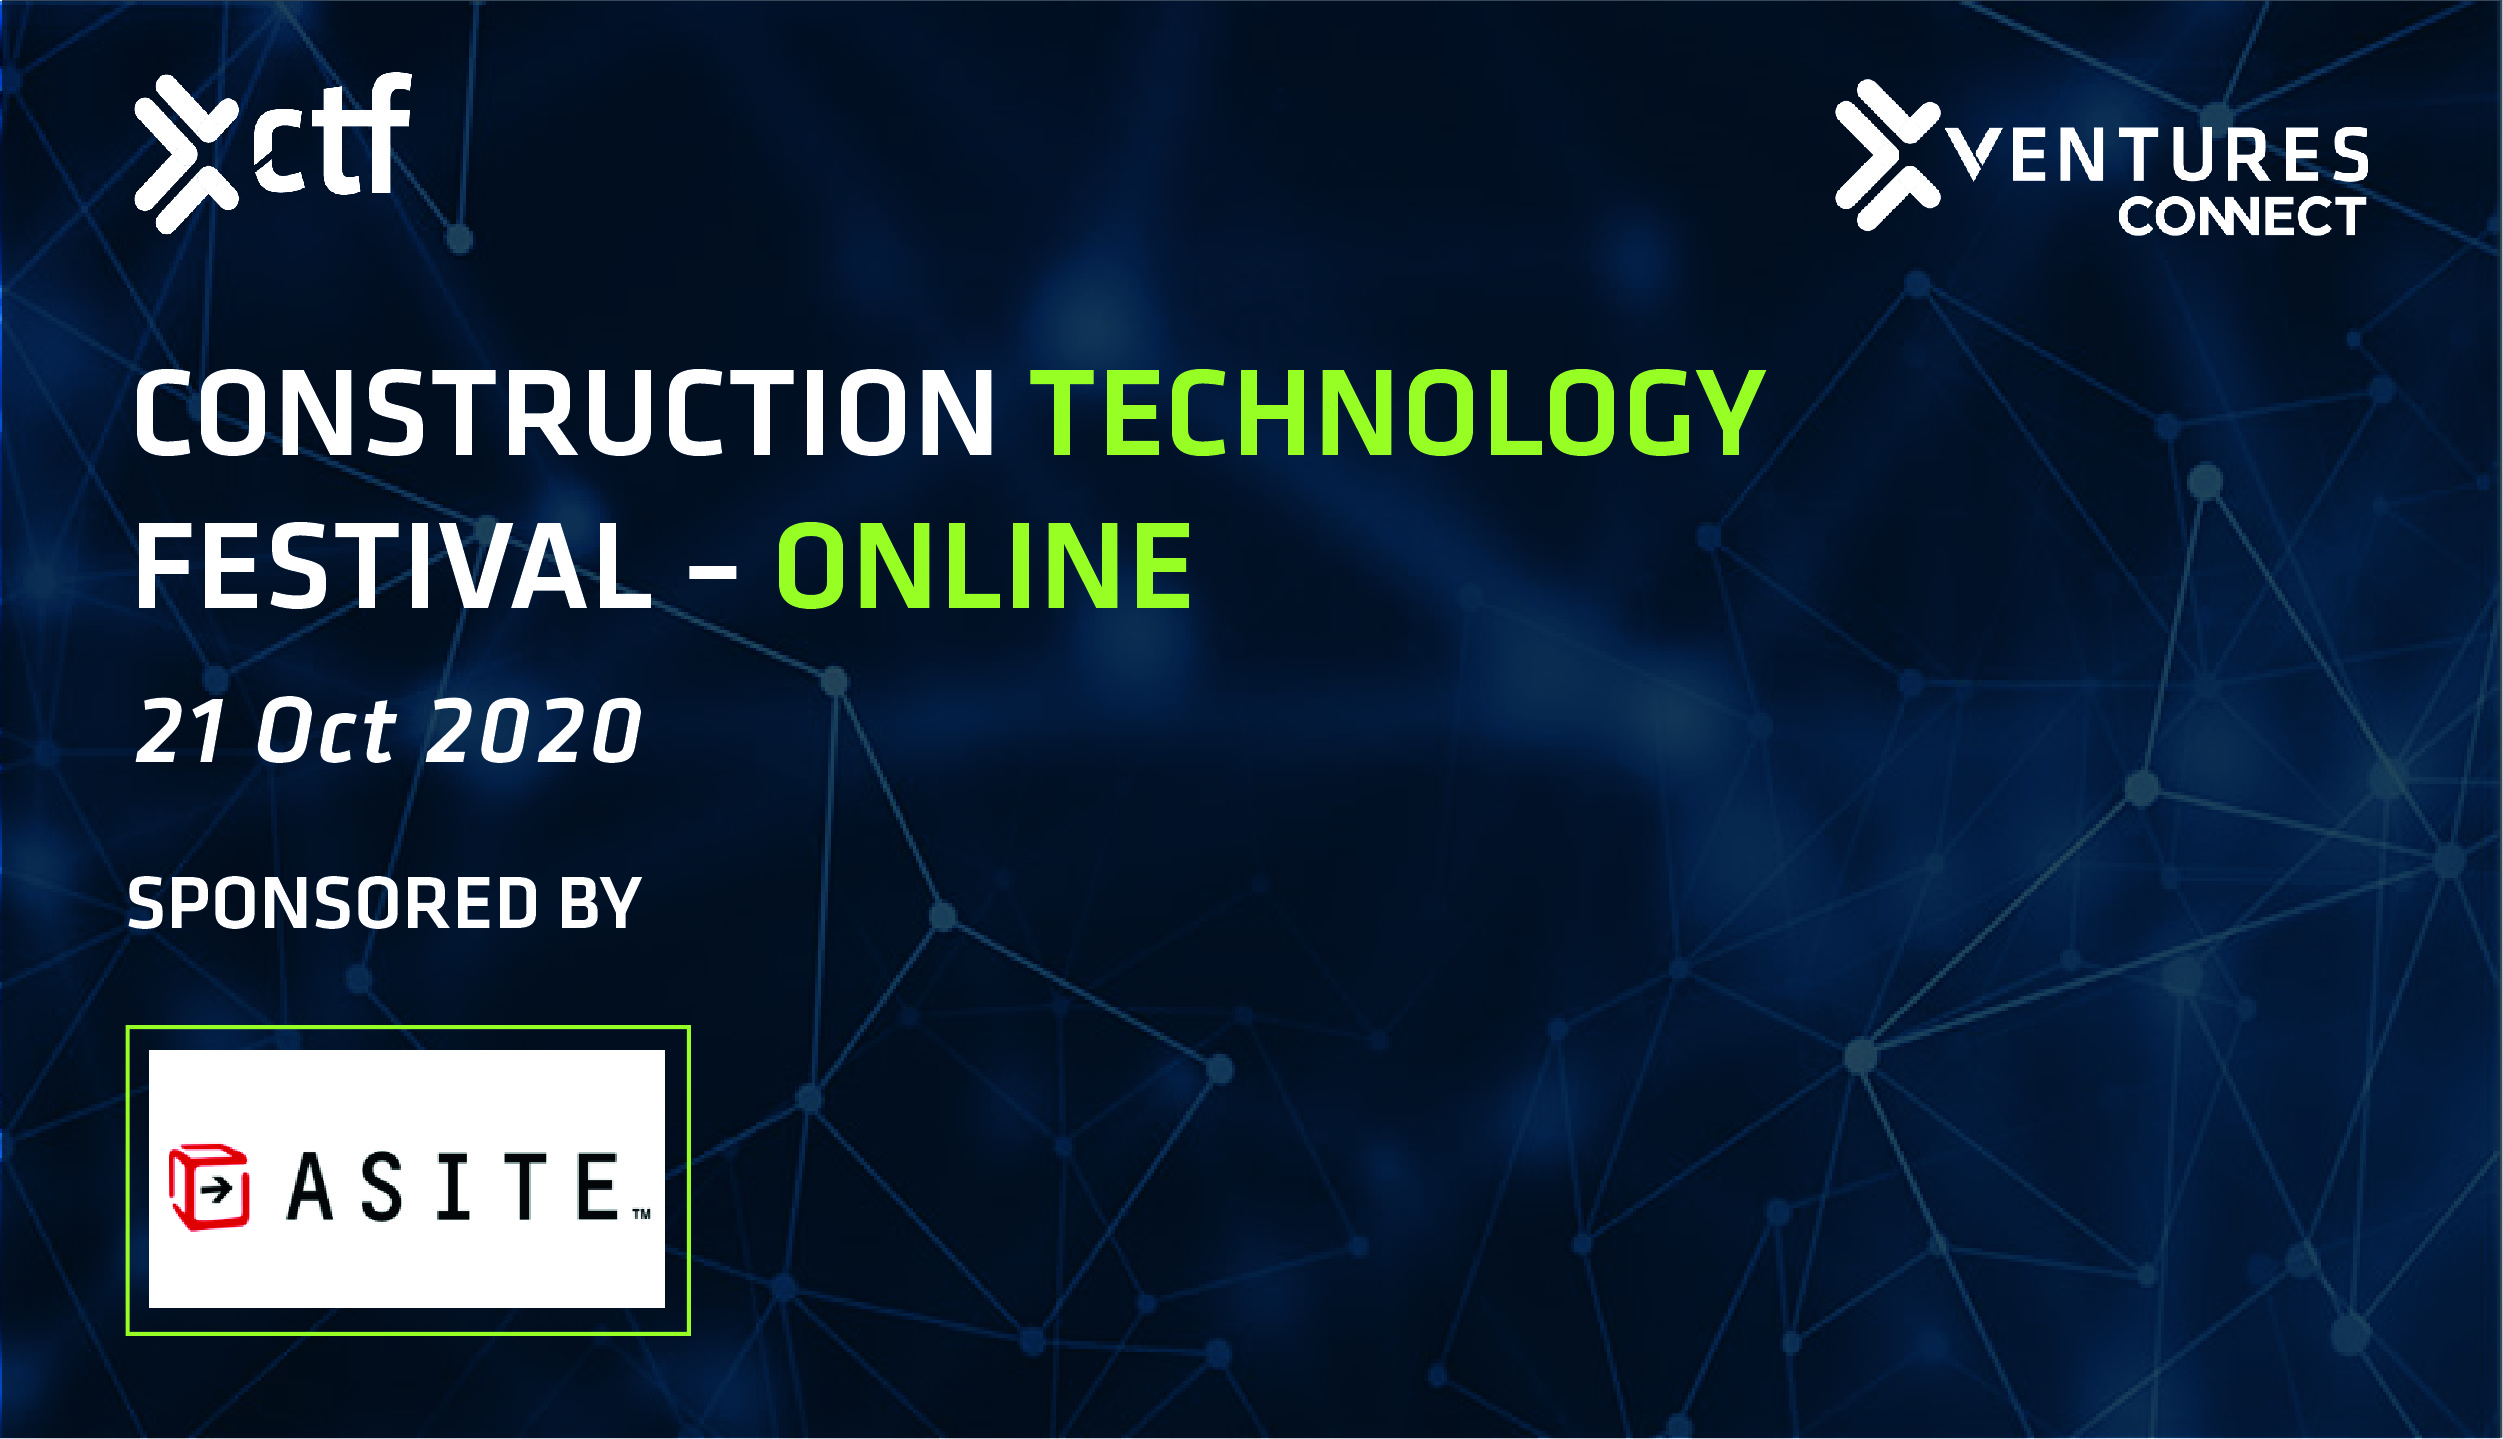 Construction Technology Festival Online 2020